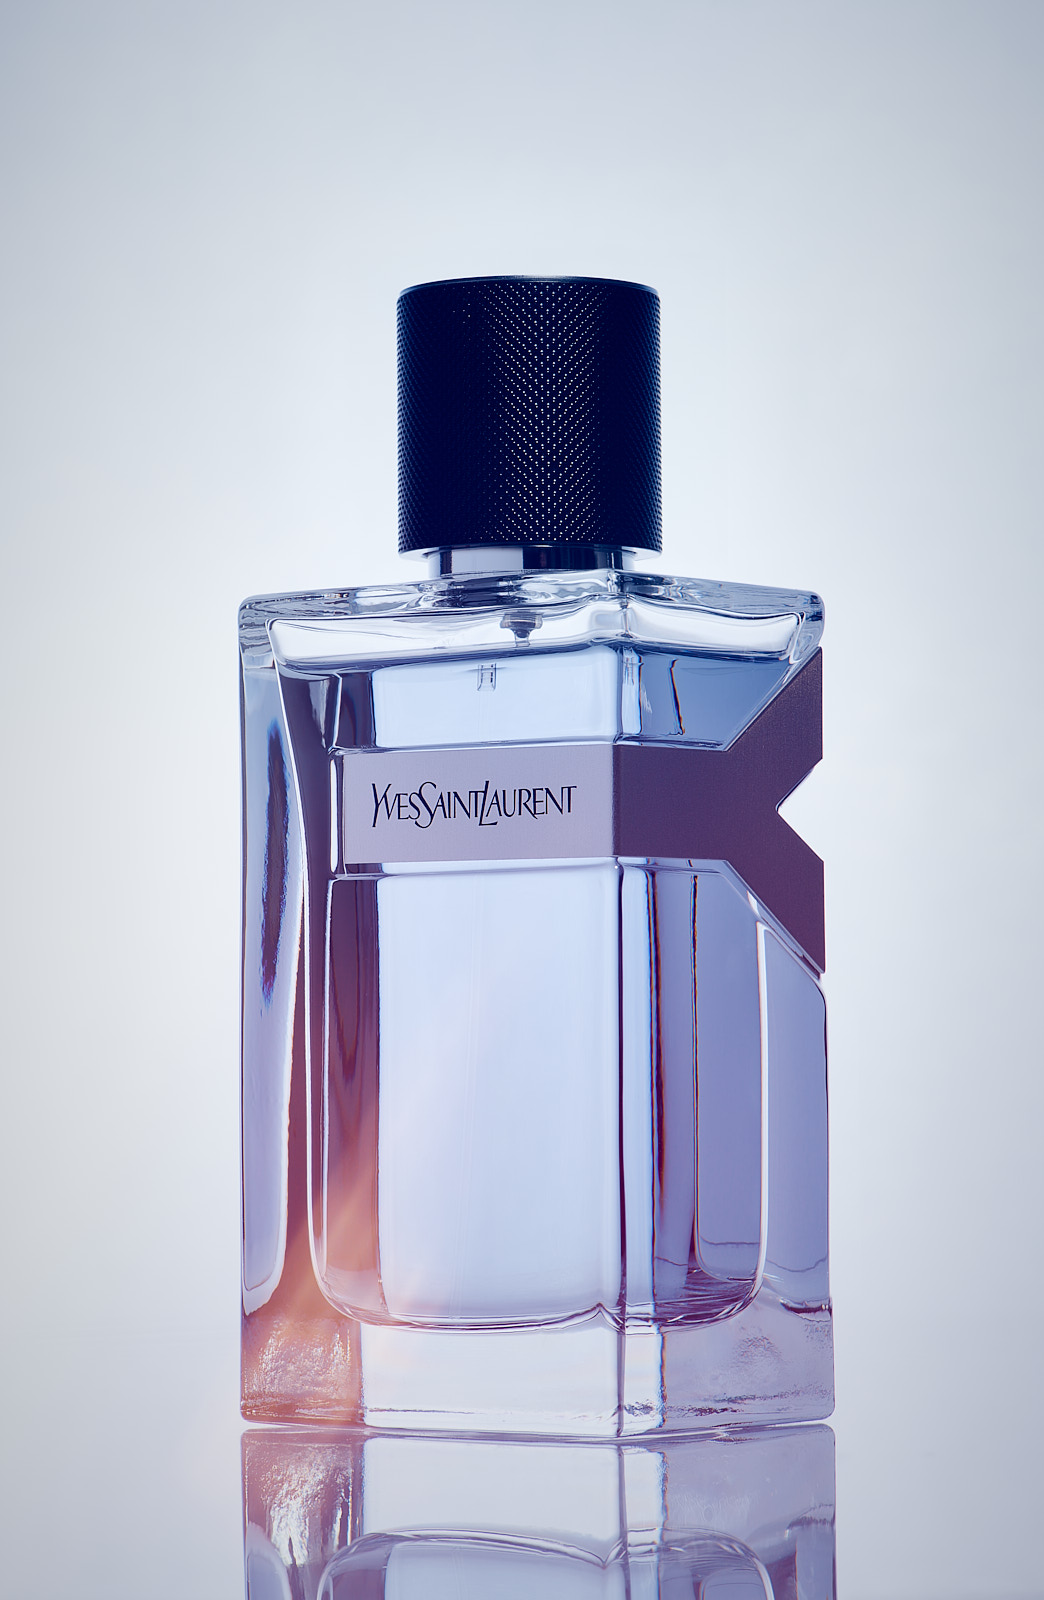 Photographe parfum